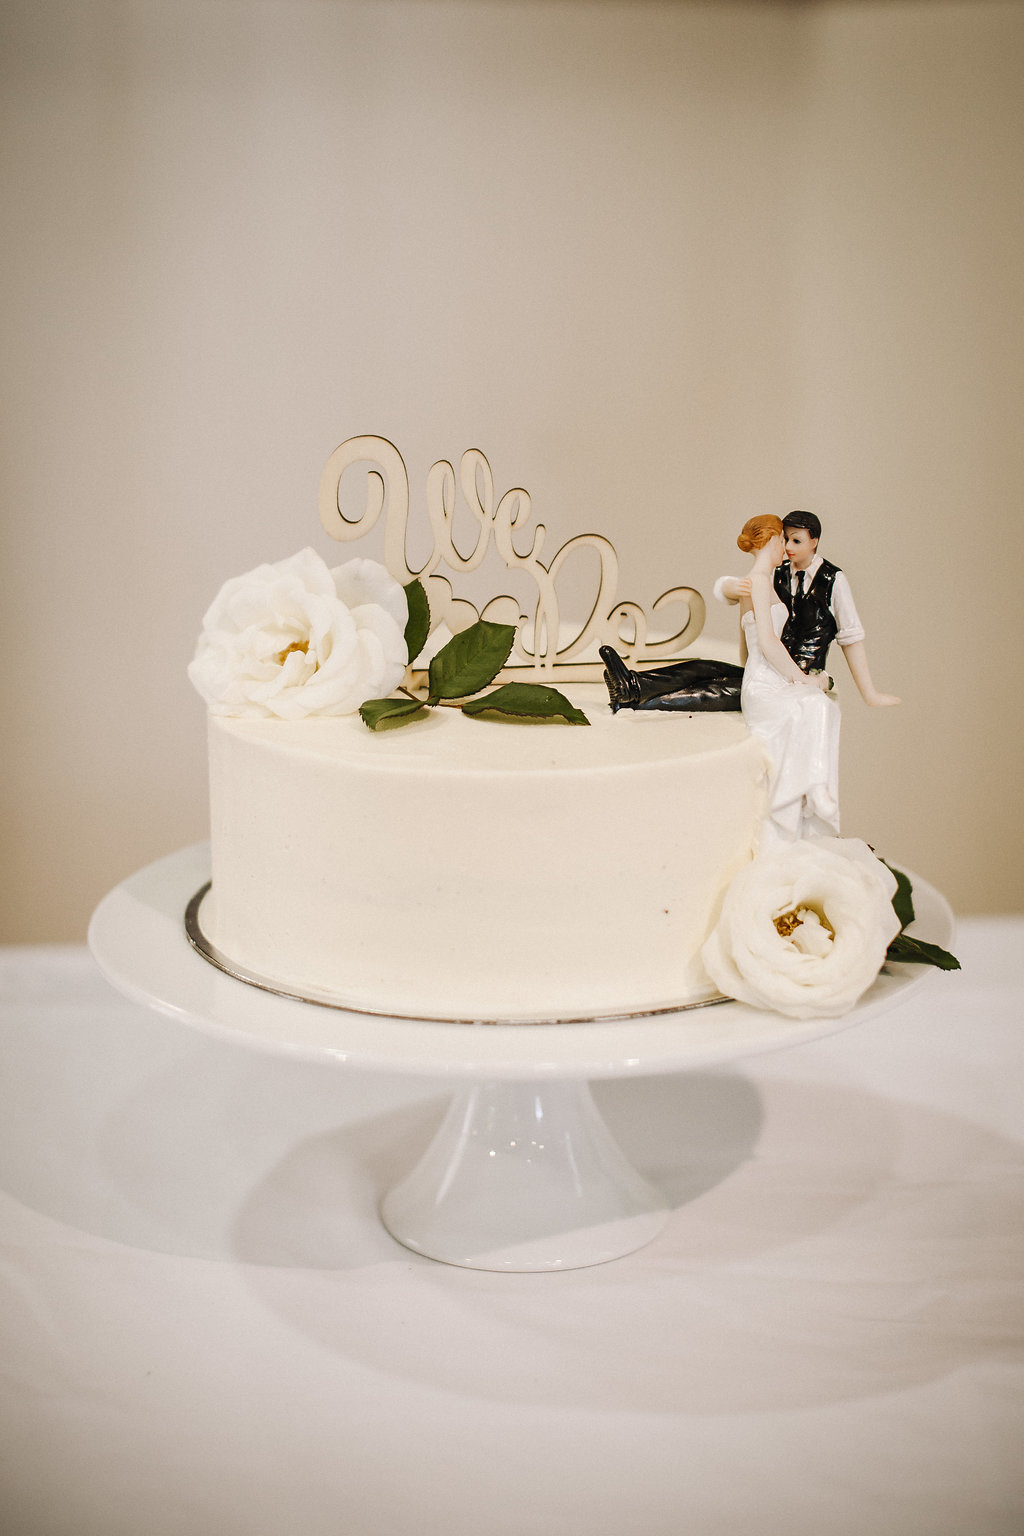 C_S_wedding_001.jpg